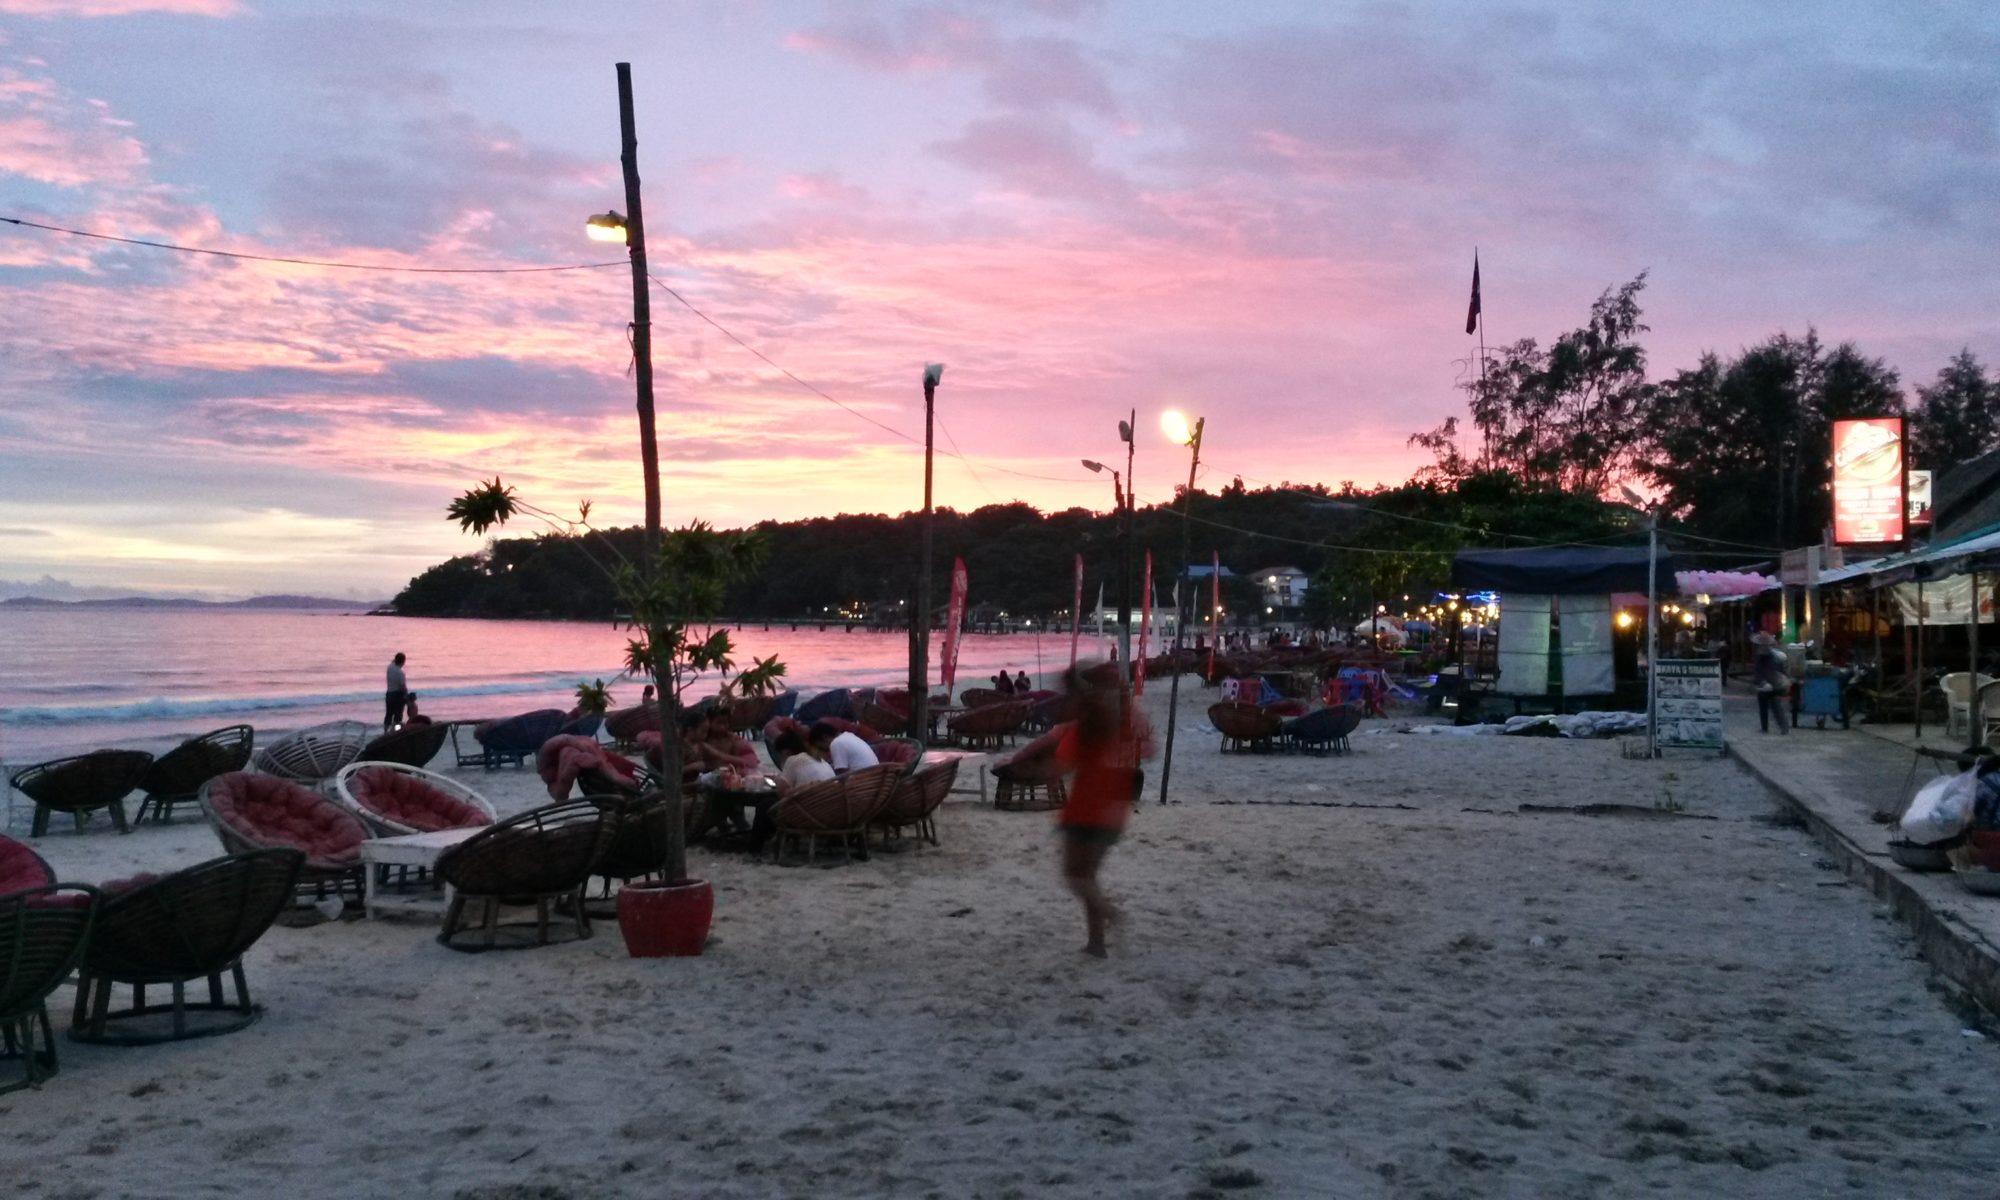 The beach at Sihanoukville